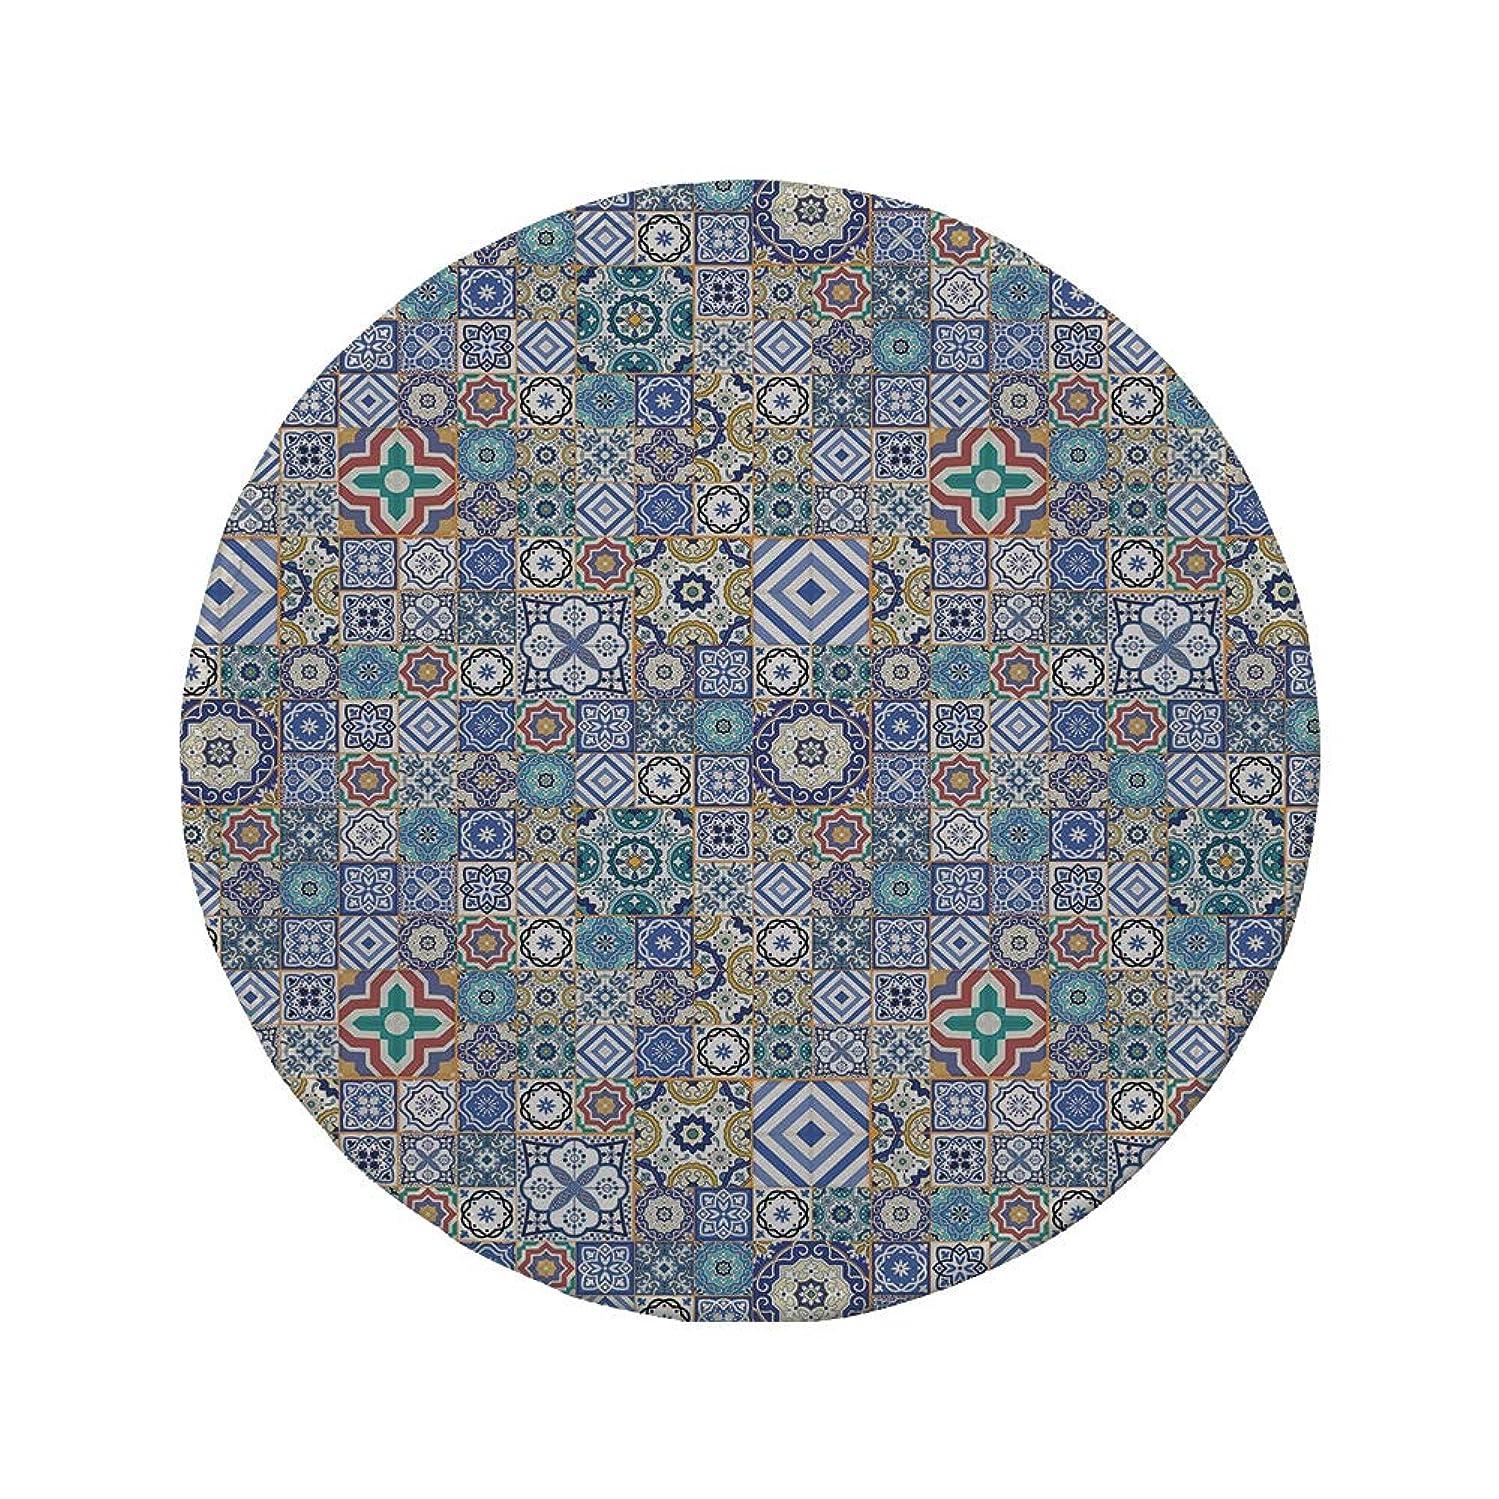 Non-Slip Rubber Round Mouse Pad,Moroccan,Grid Style Squares Ornamental Geometric Elements Oriental Culture Illustration,Multicolor,7.87